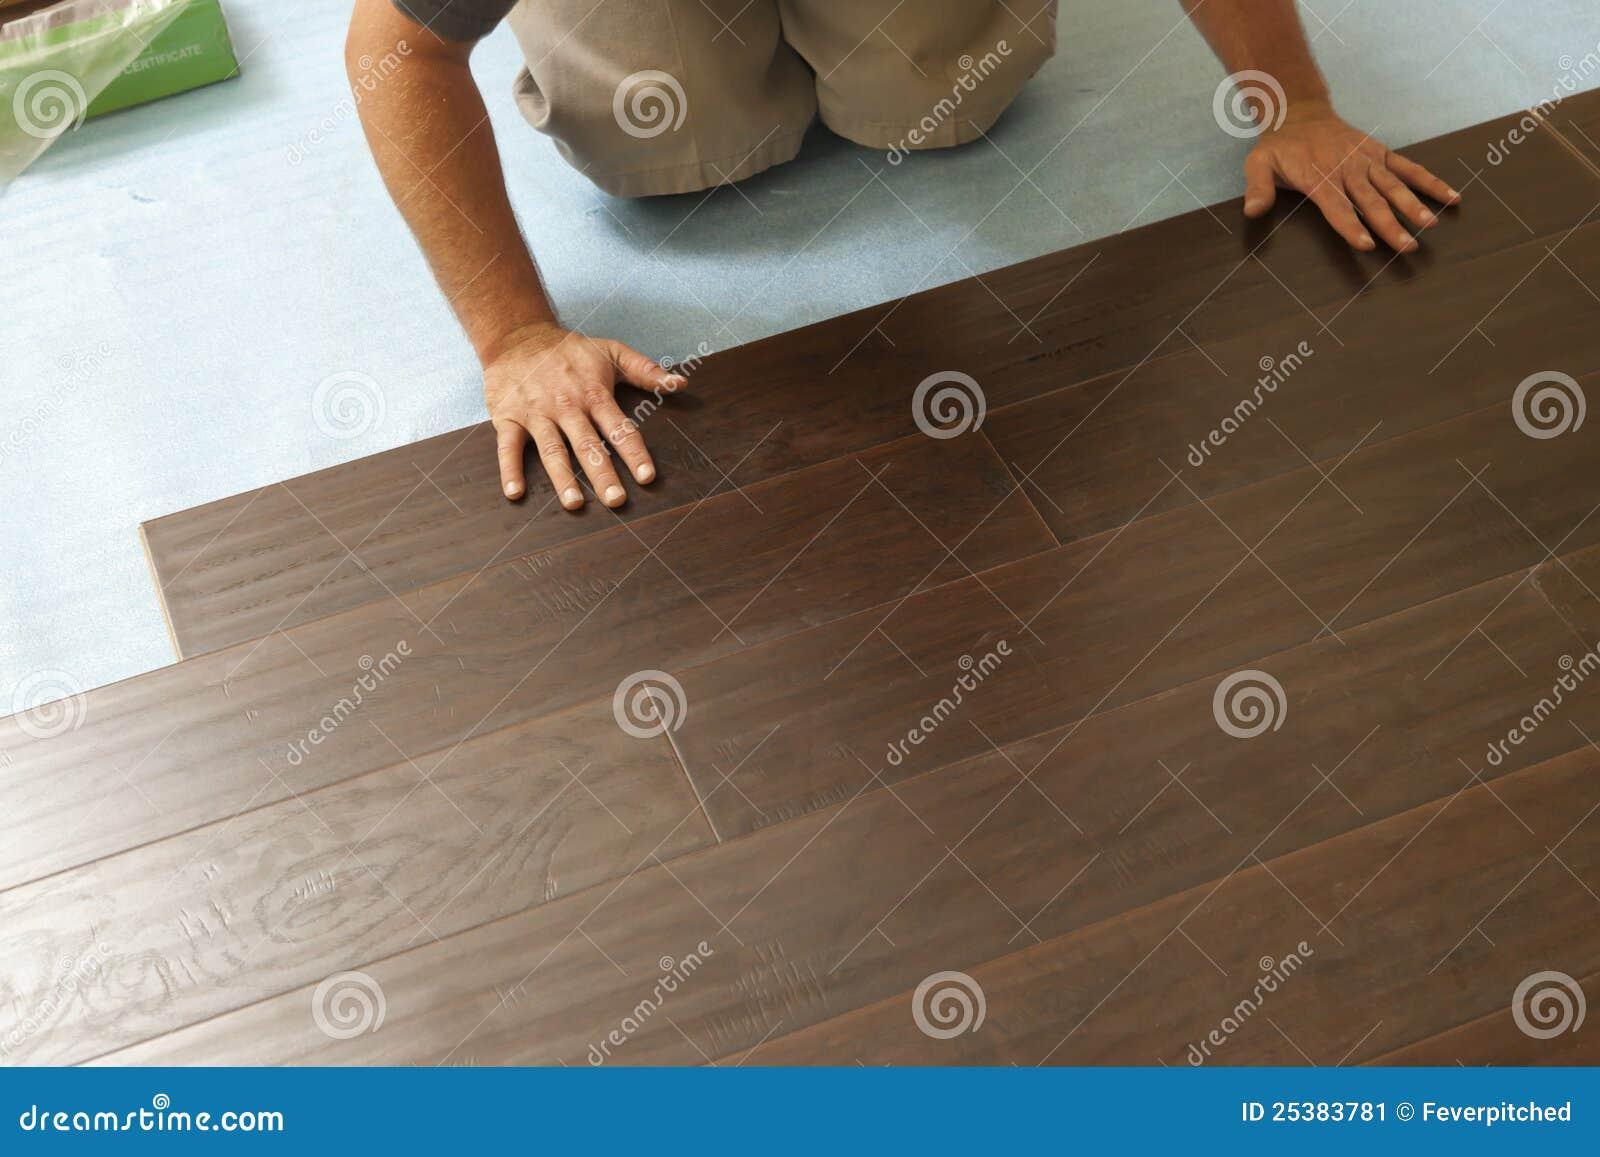 Man installing new laminate wood flooring stock image for Laying laminate flooring